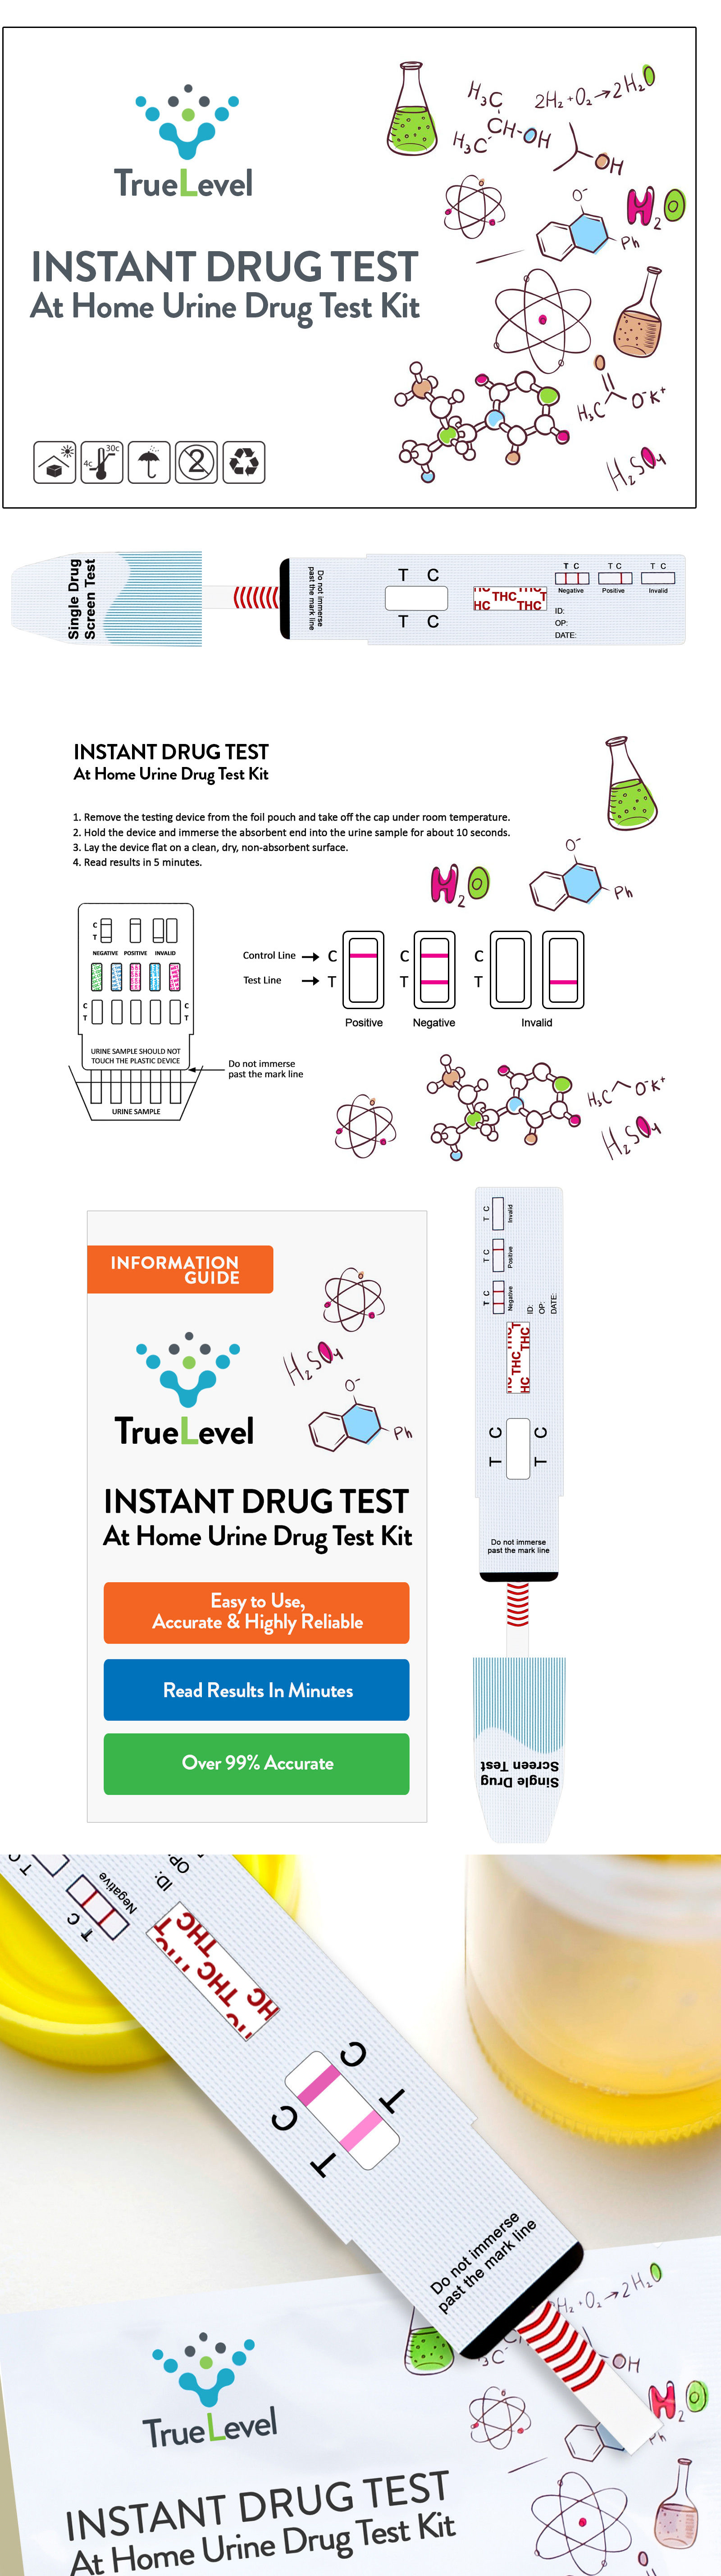 Drug Testing: True Level Marijuana Thc Single Panel Drug Screen Test Kit Dip Card -> BUY IT NOW ONLY: $59.95 on eBay!